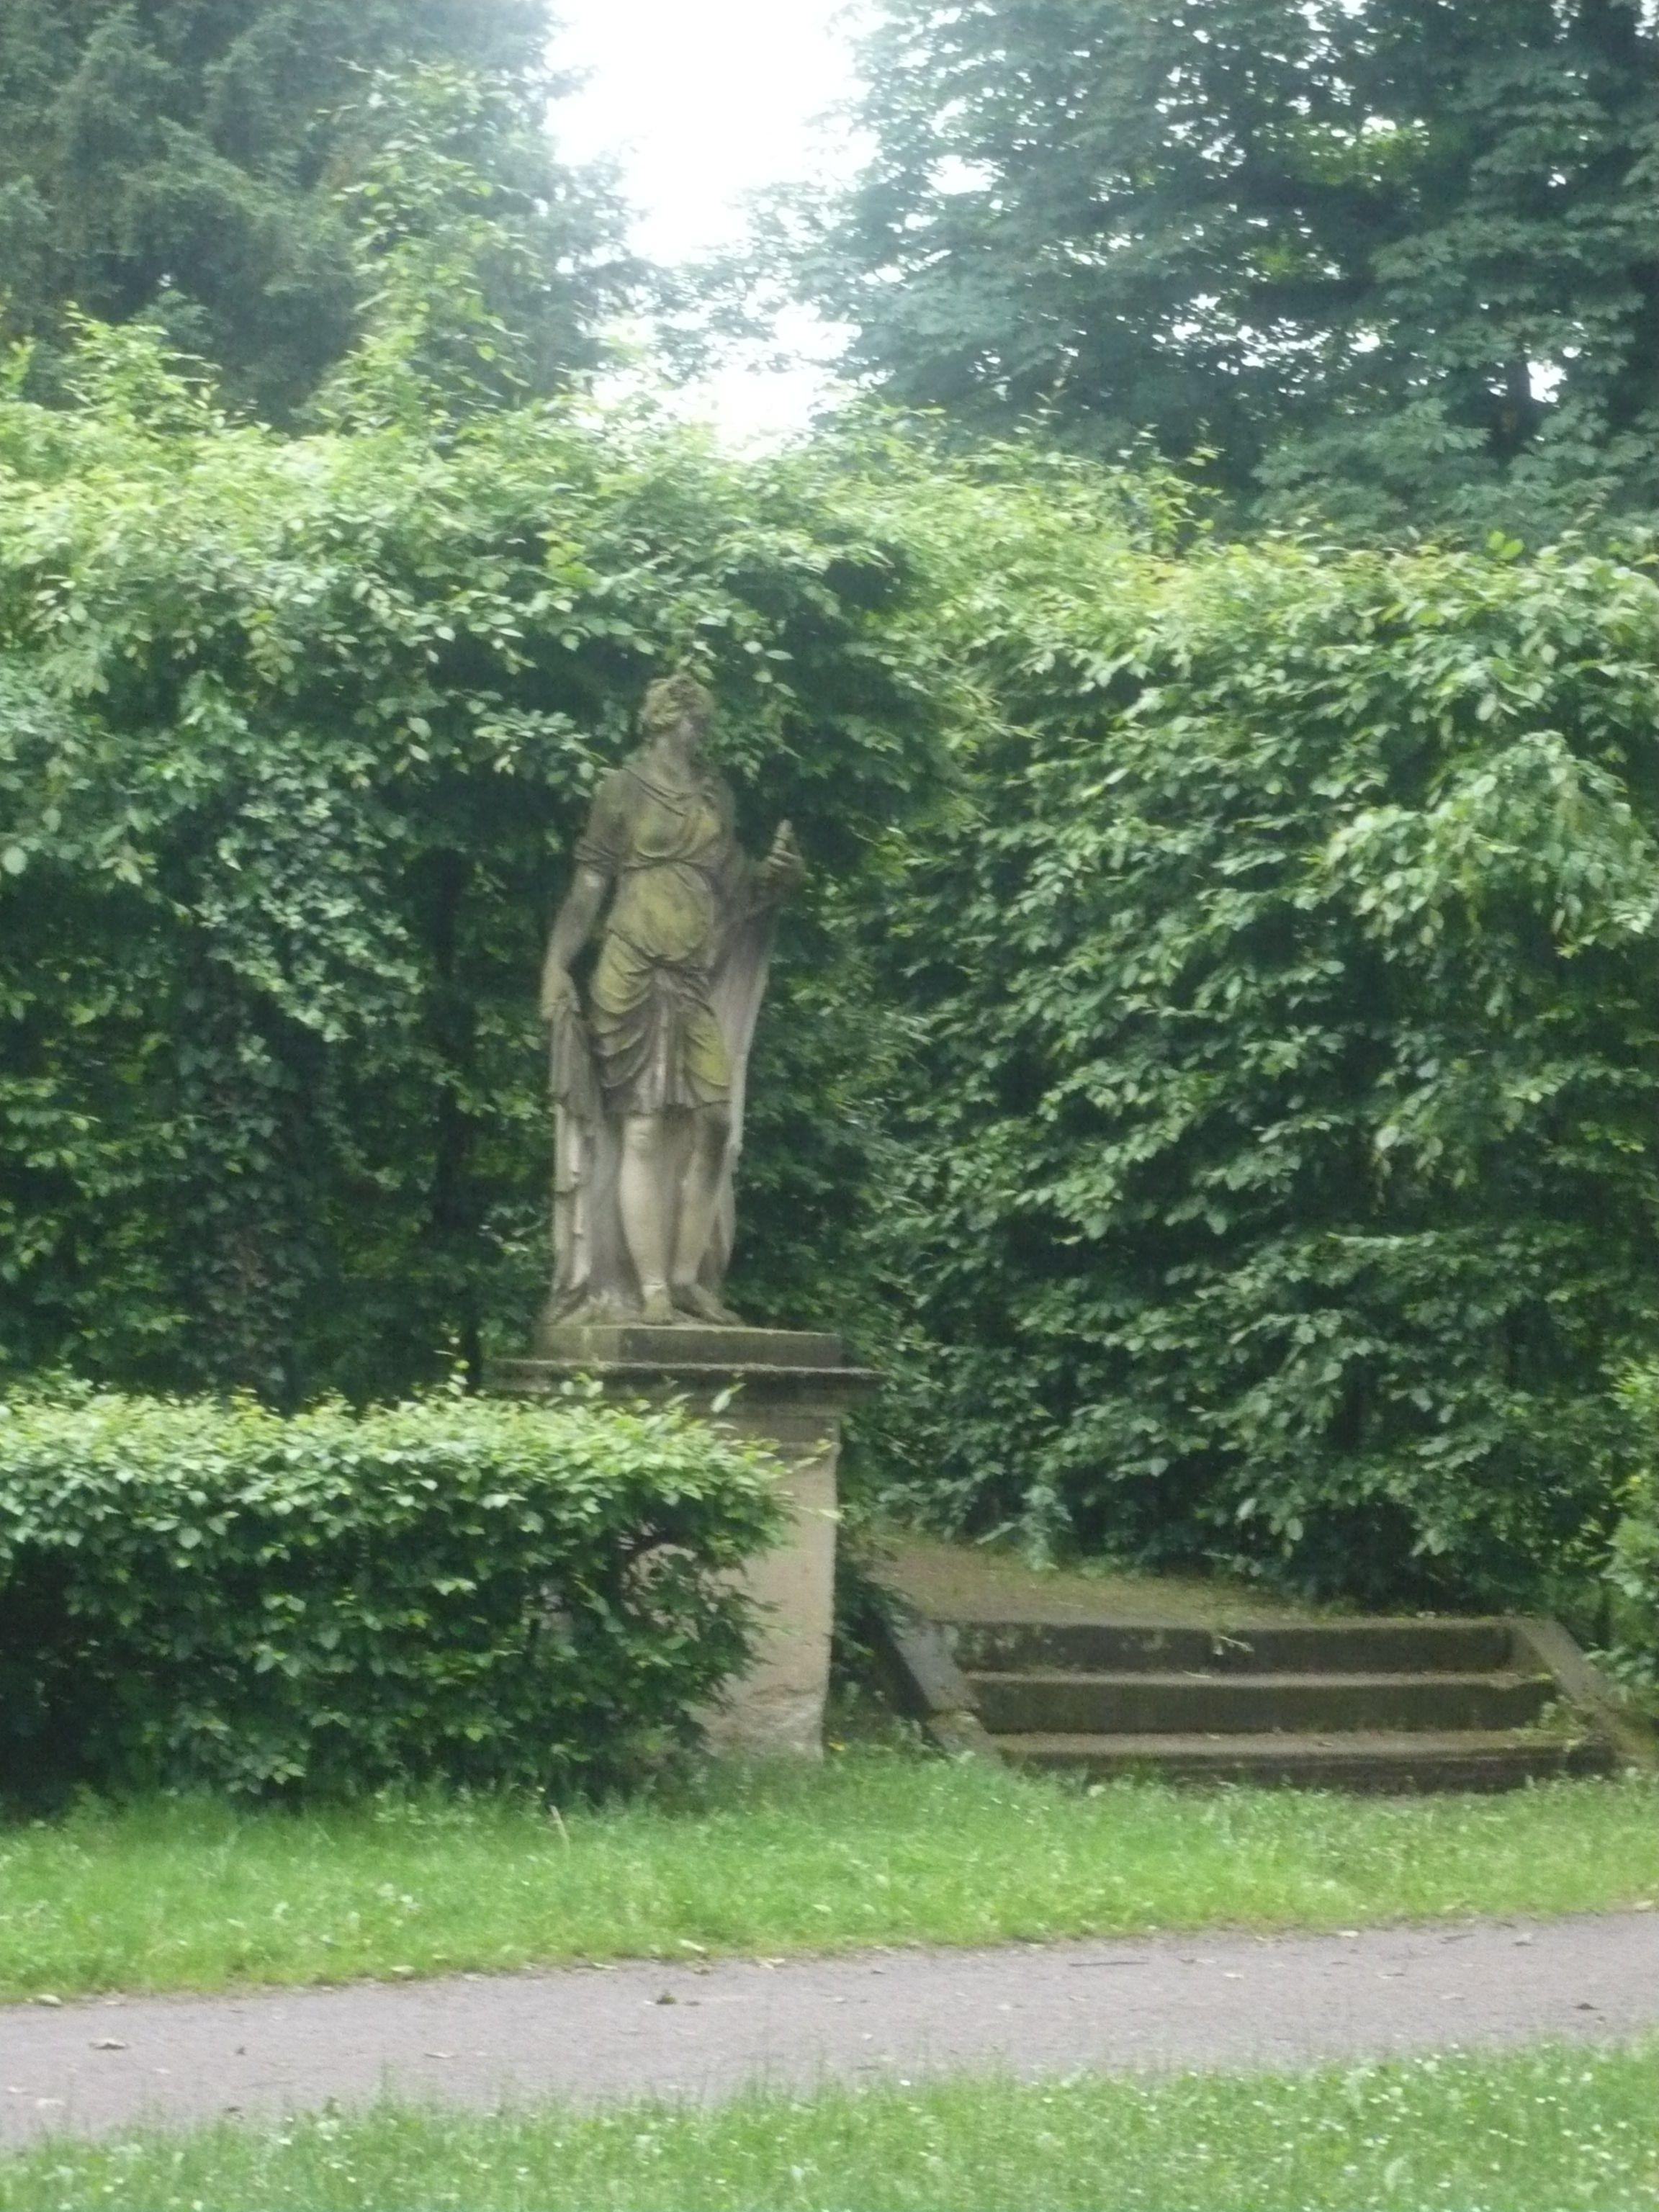 Schloss Und Park Altdobern Mit Bildern Fahrradtour Schloss Bau